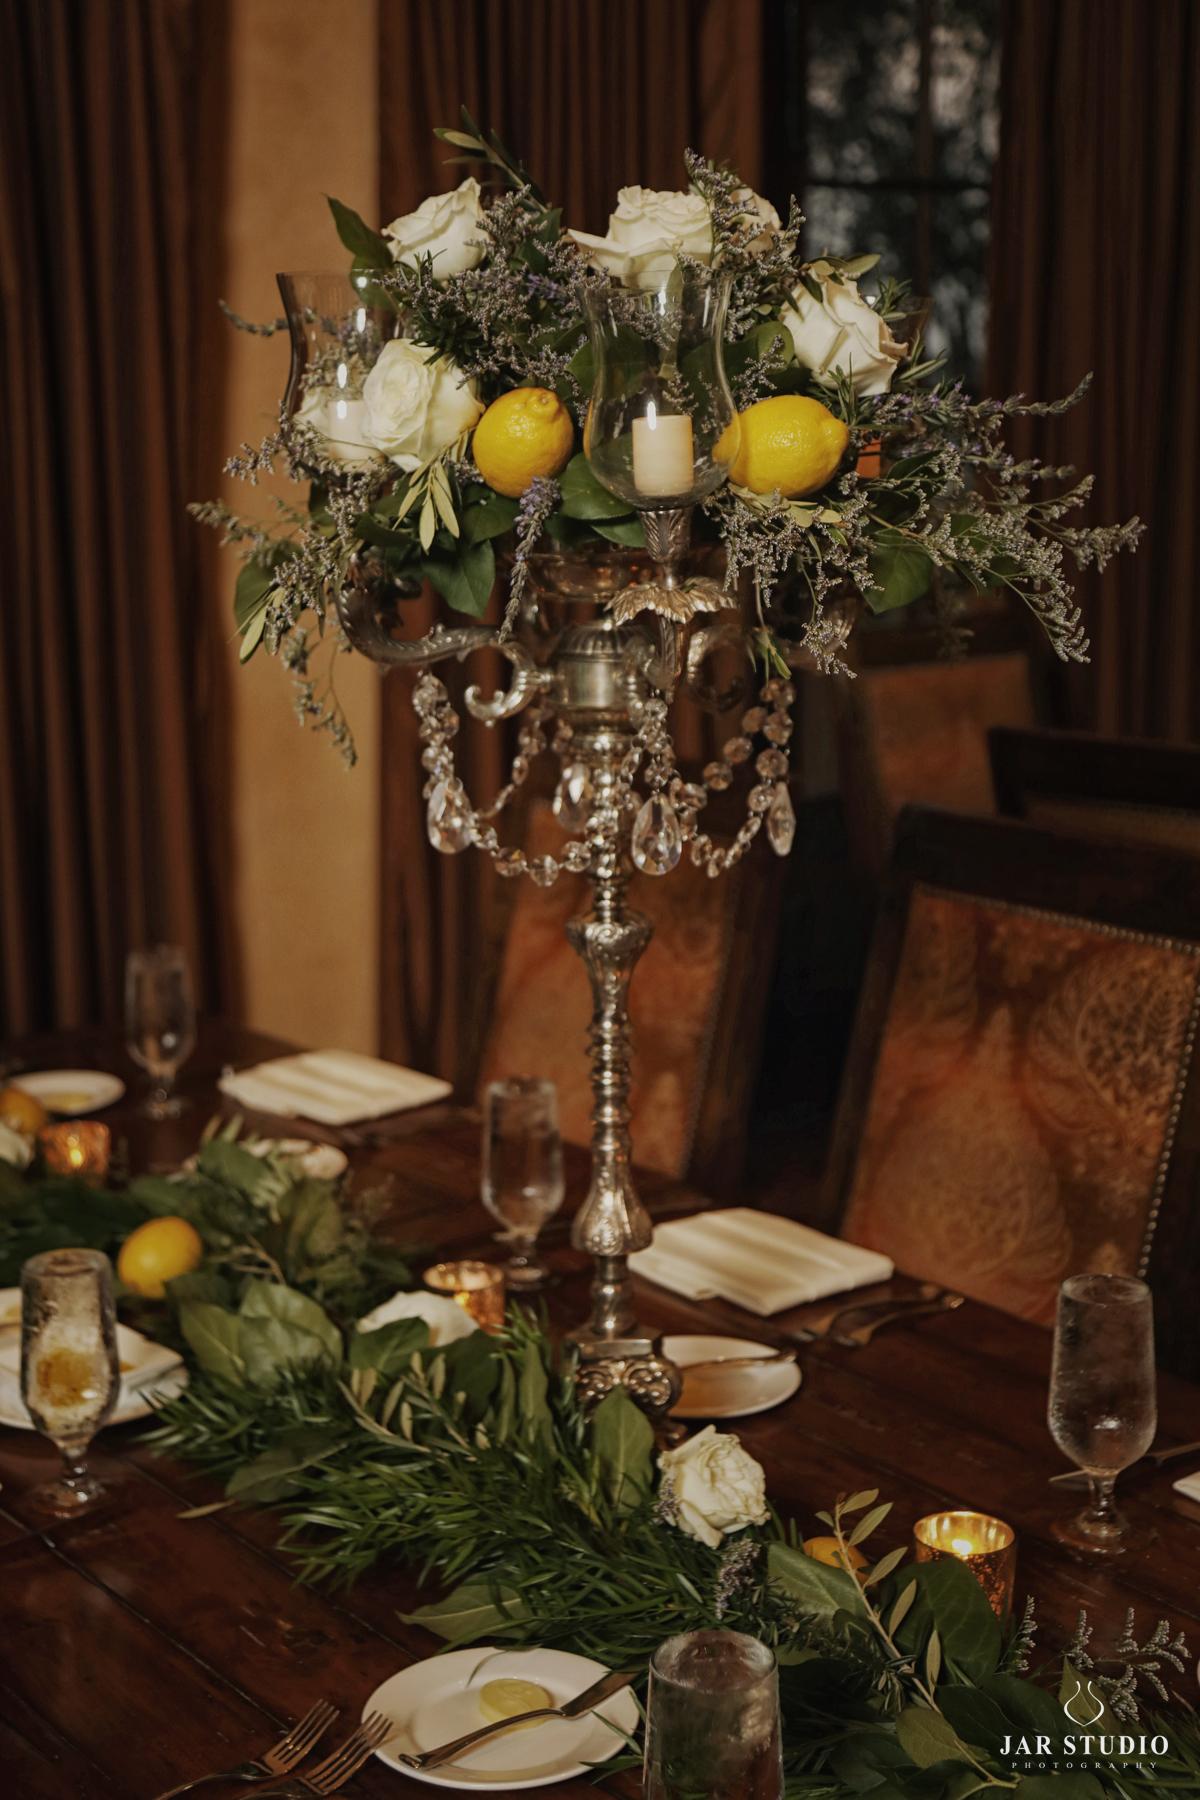 33-dinner-table-wedding-reception-elegant-candles-jarstudio.jpg